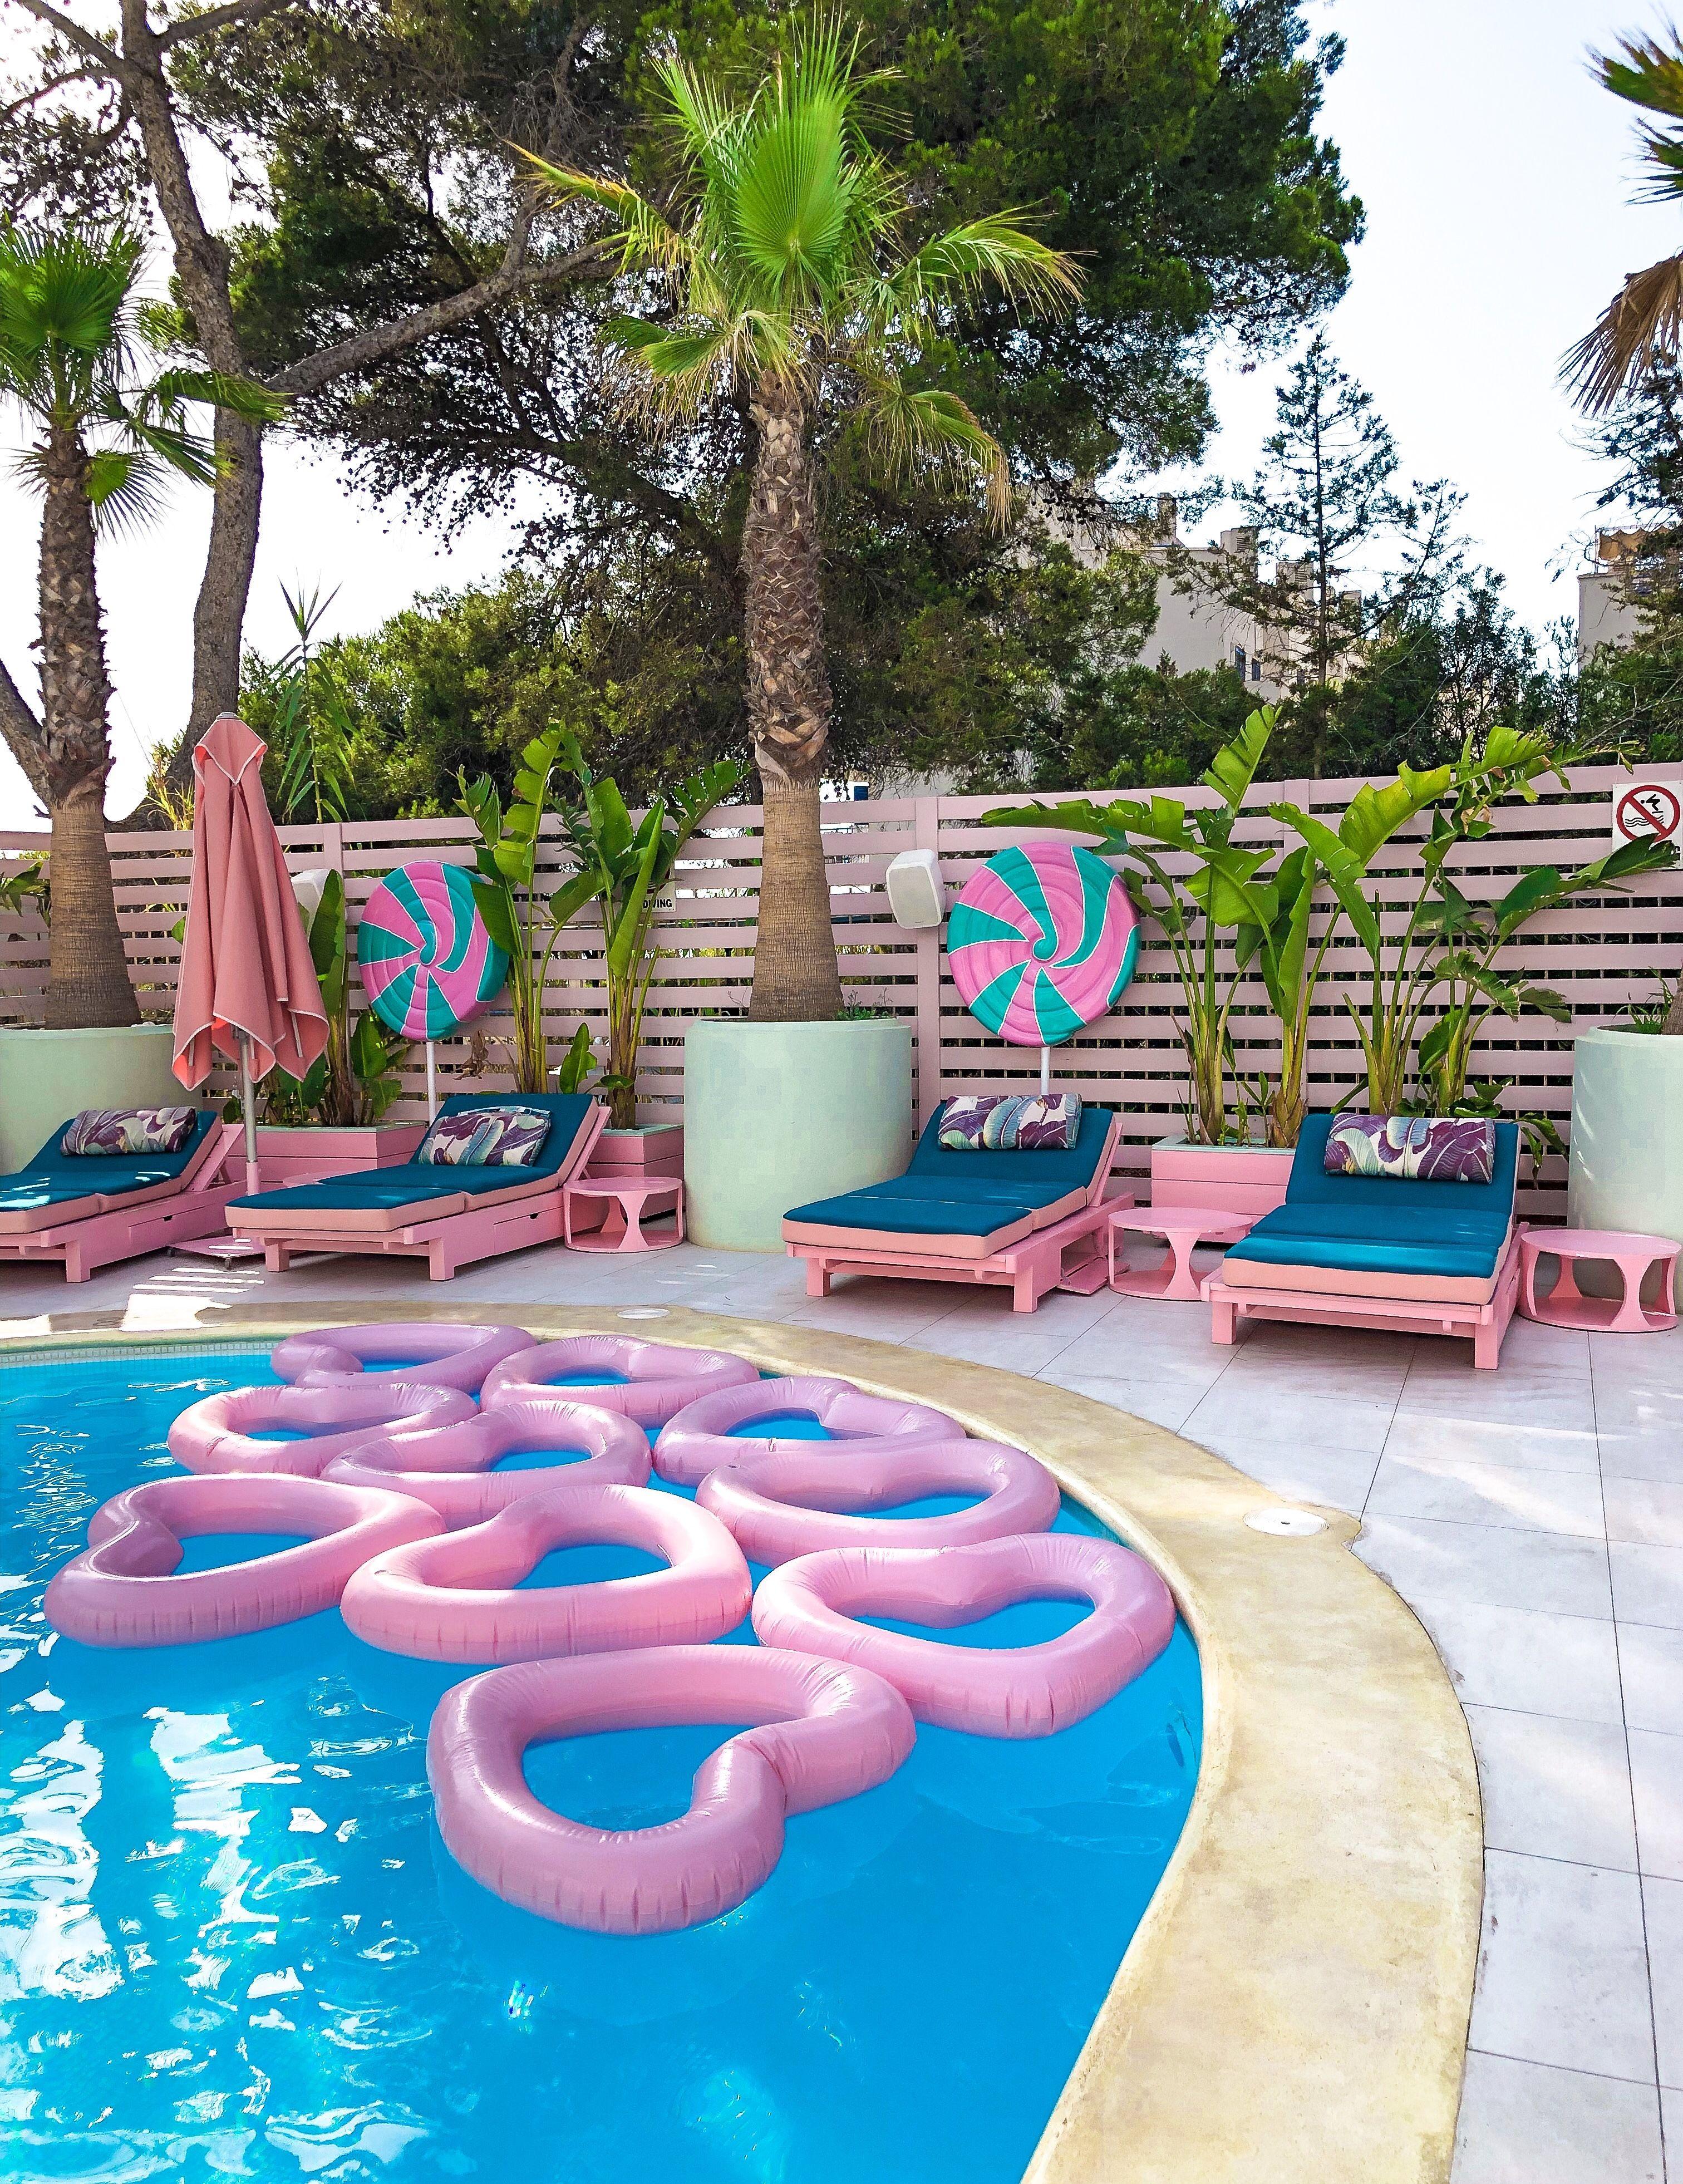 Pool Goals Wi Ki Woo Ibiza Hotel Ibiza Pink Hotel Pool Floaties